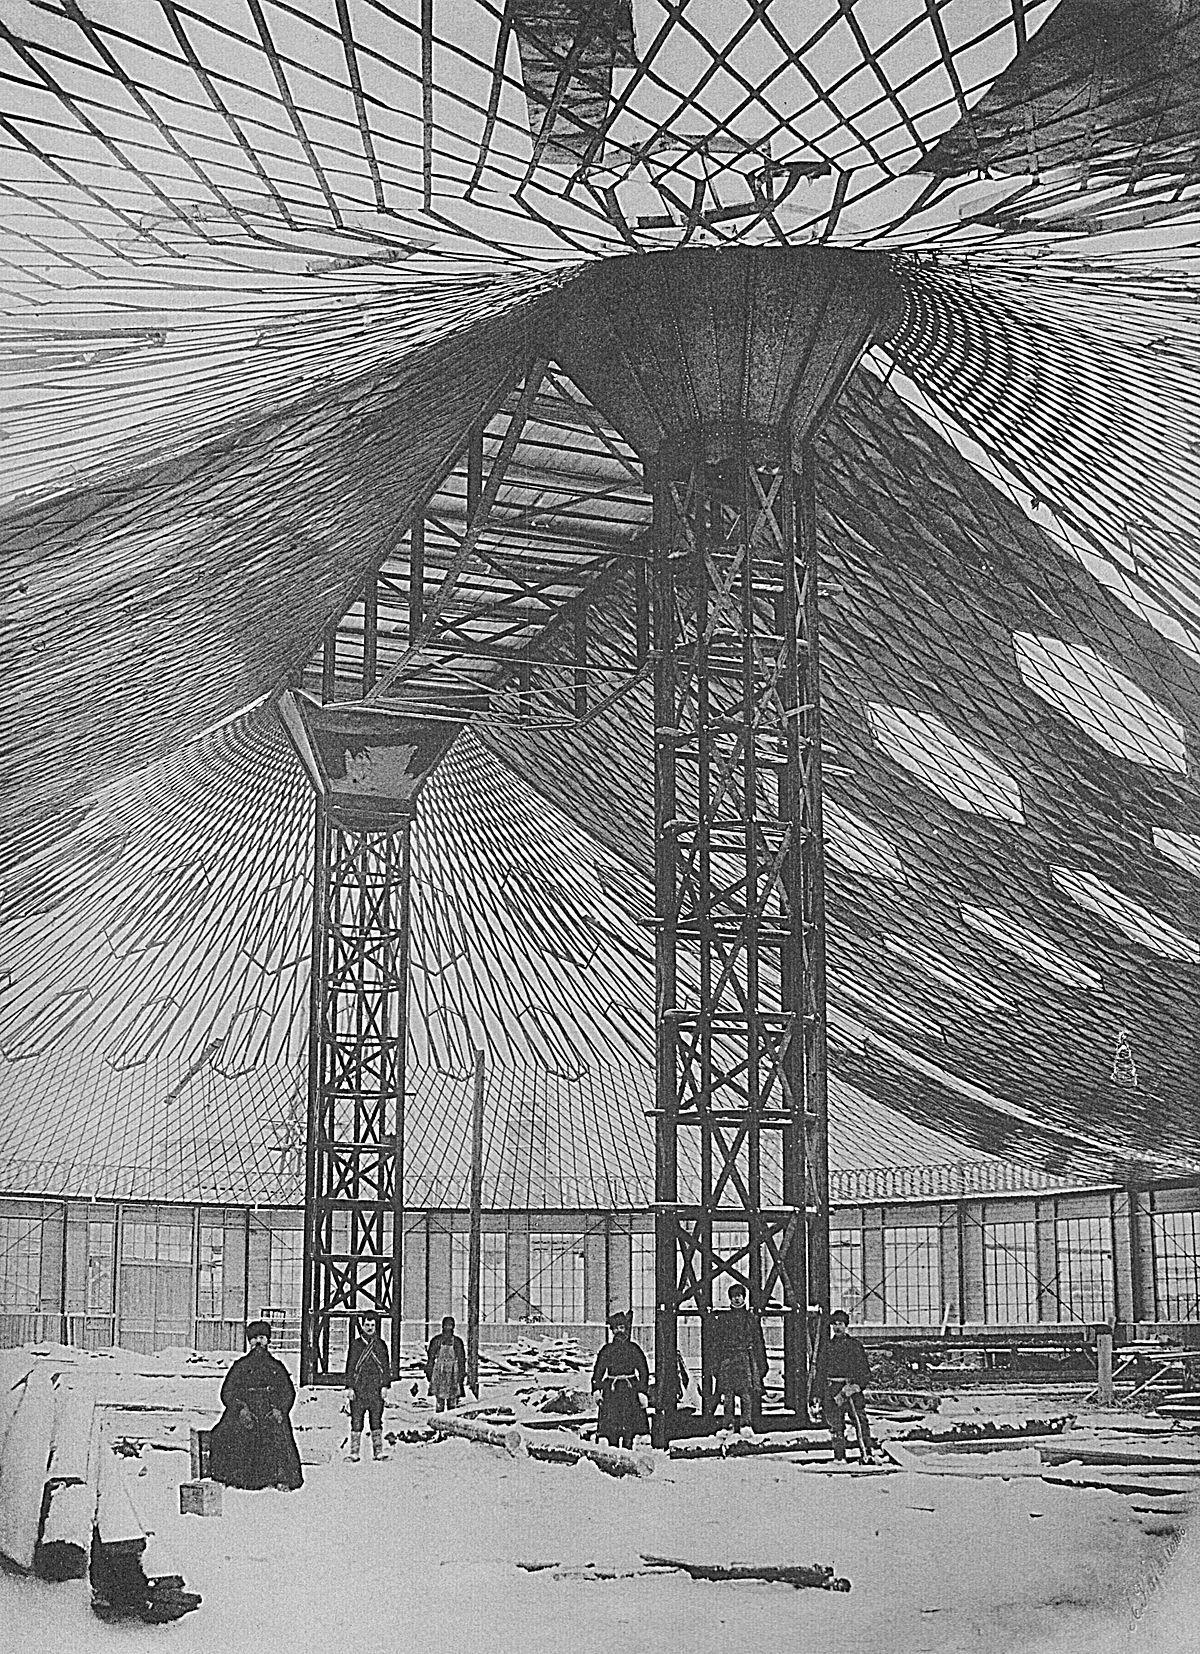 The world's first tensile steel Shell by Vladimir Shukhov